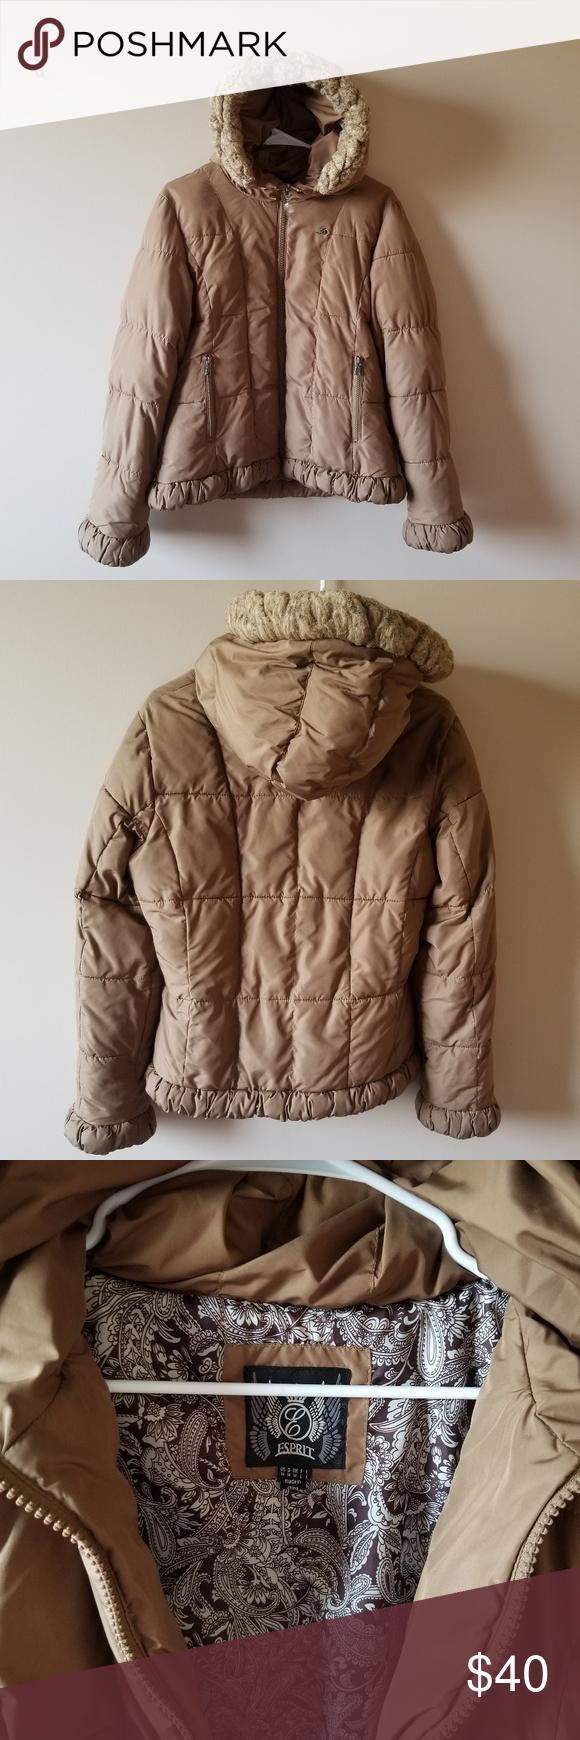 Esprit Winter Jacket Winter Jackets Jackets Clothes Design [ 1740 x 580 Pixel ]